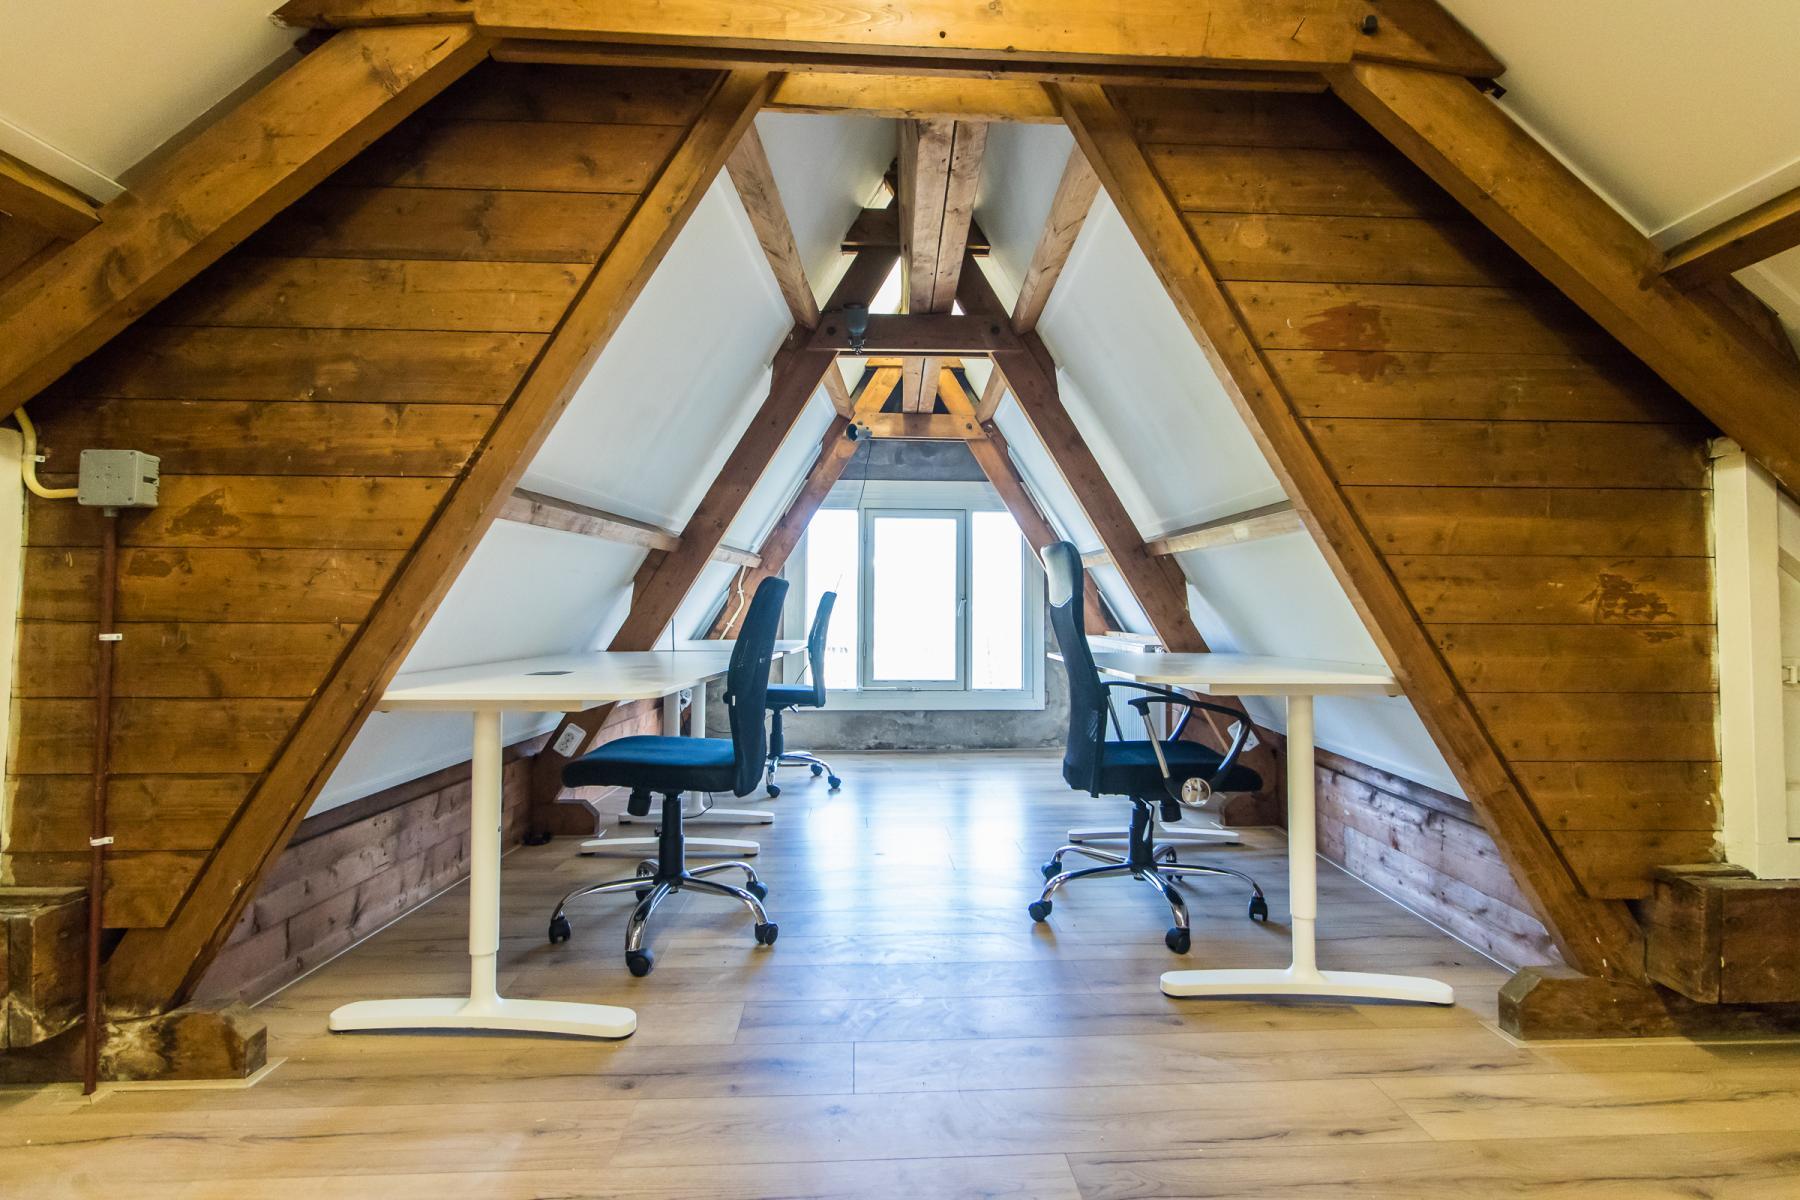 Monumental office building Amsterdam